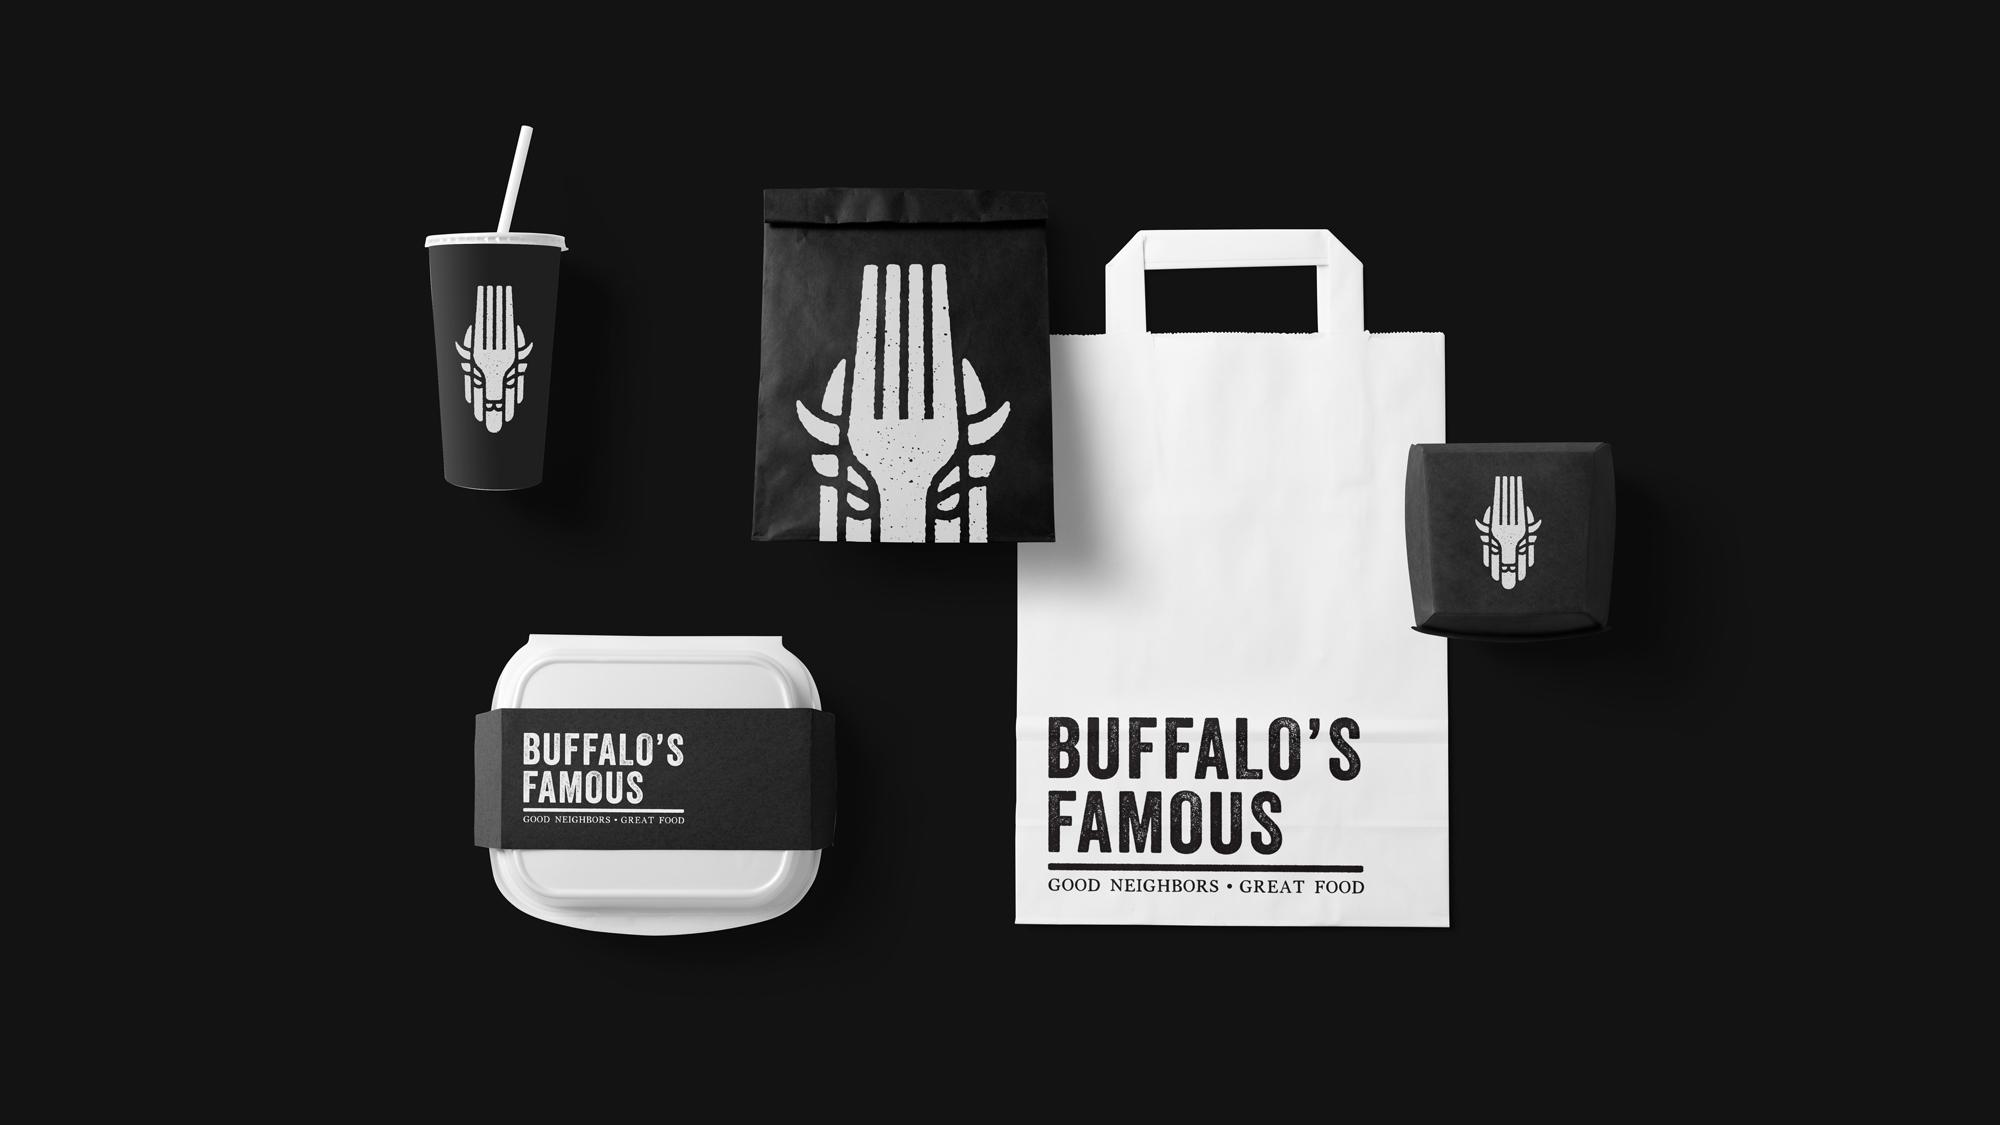 BuffalosFamous_1